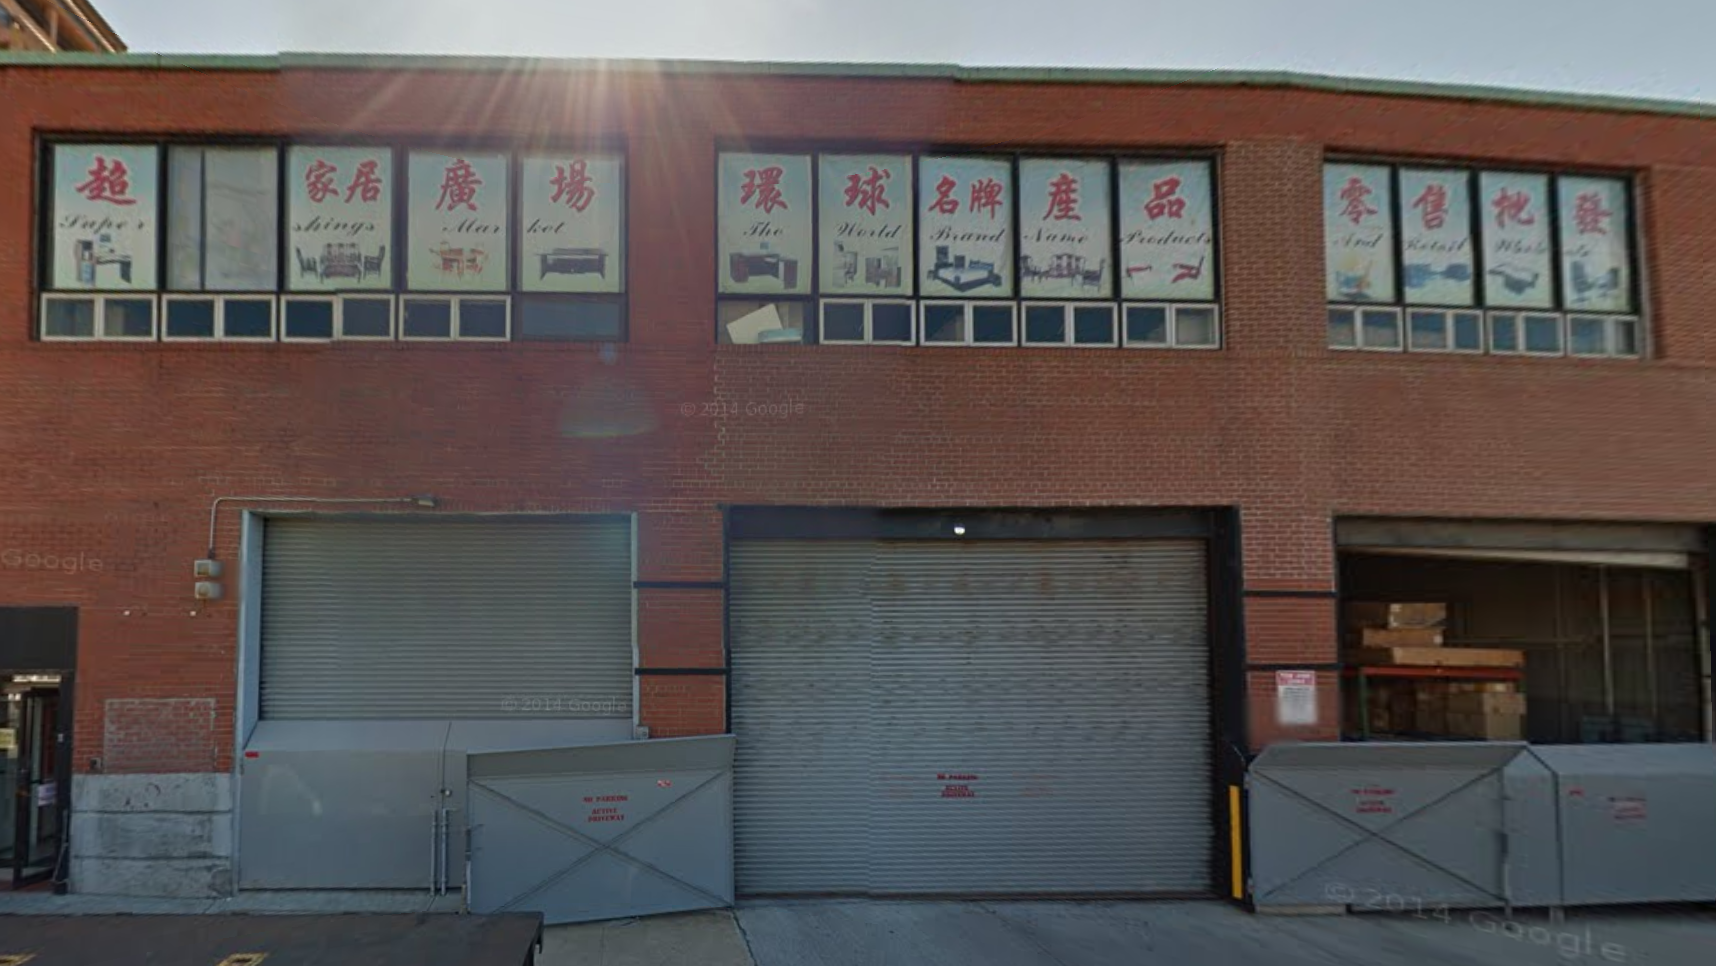 133-34 36th Road, image via Google Maps